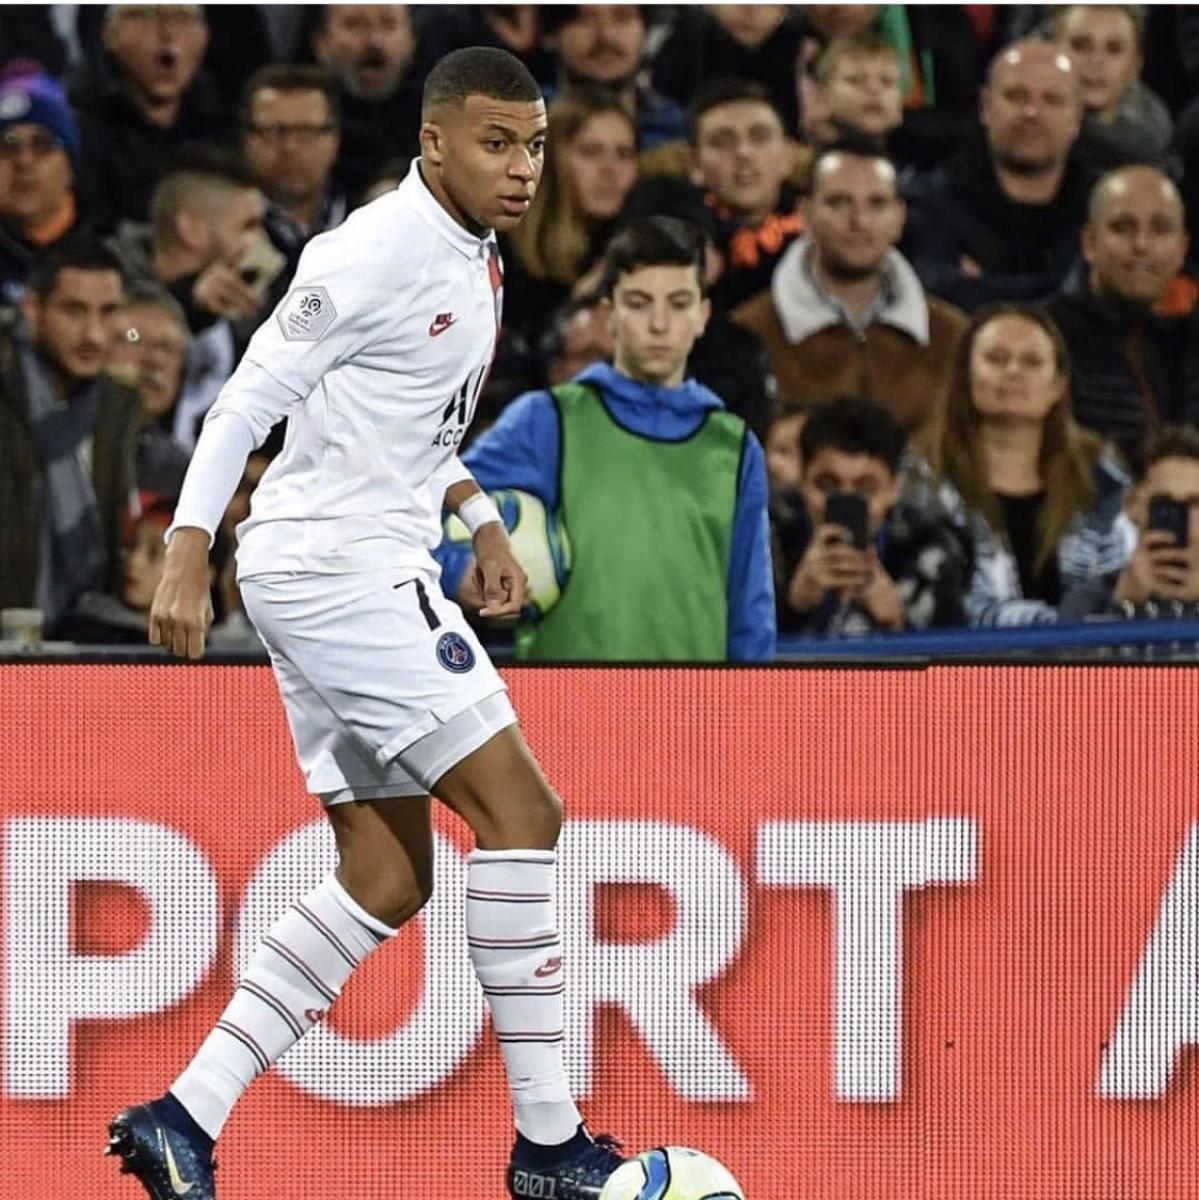 'They are a machine': PSG striker Kylian Mbappe praises Jurgen Klopp's Liverpool